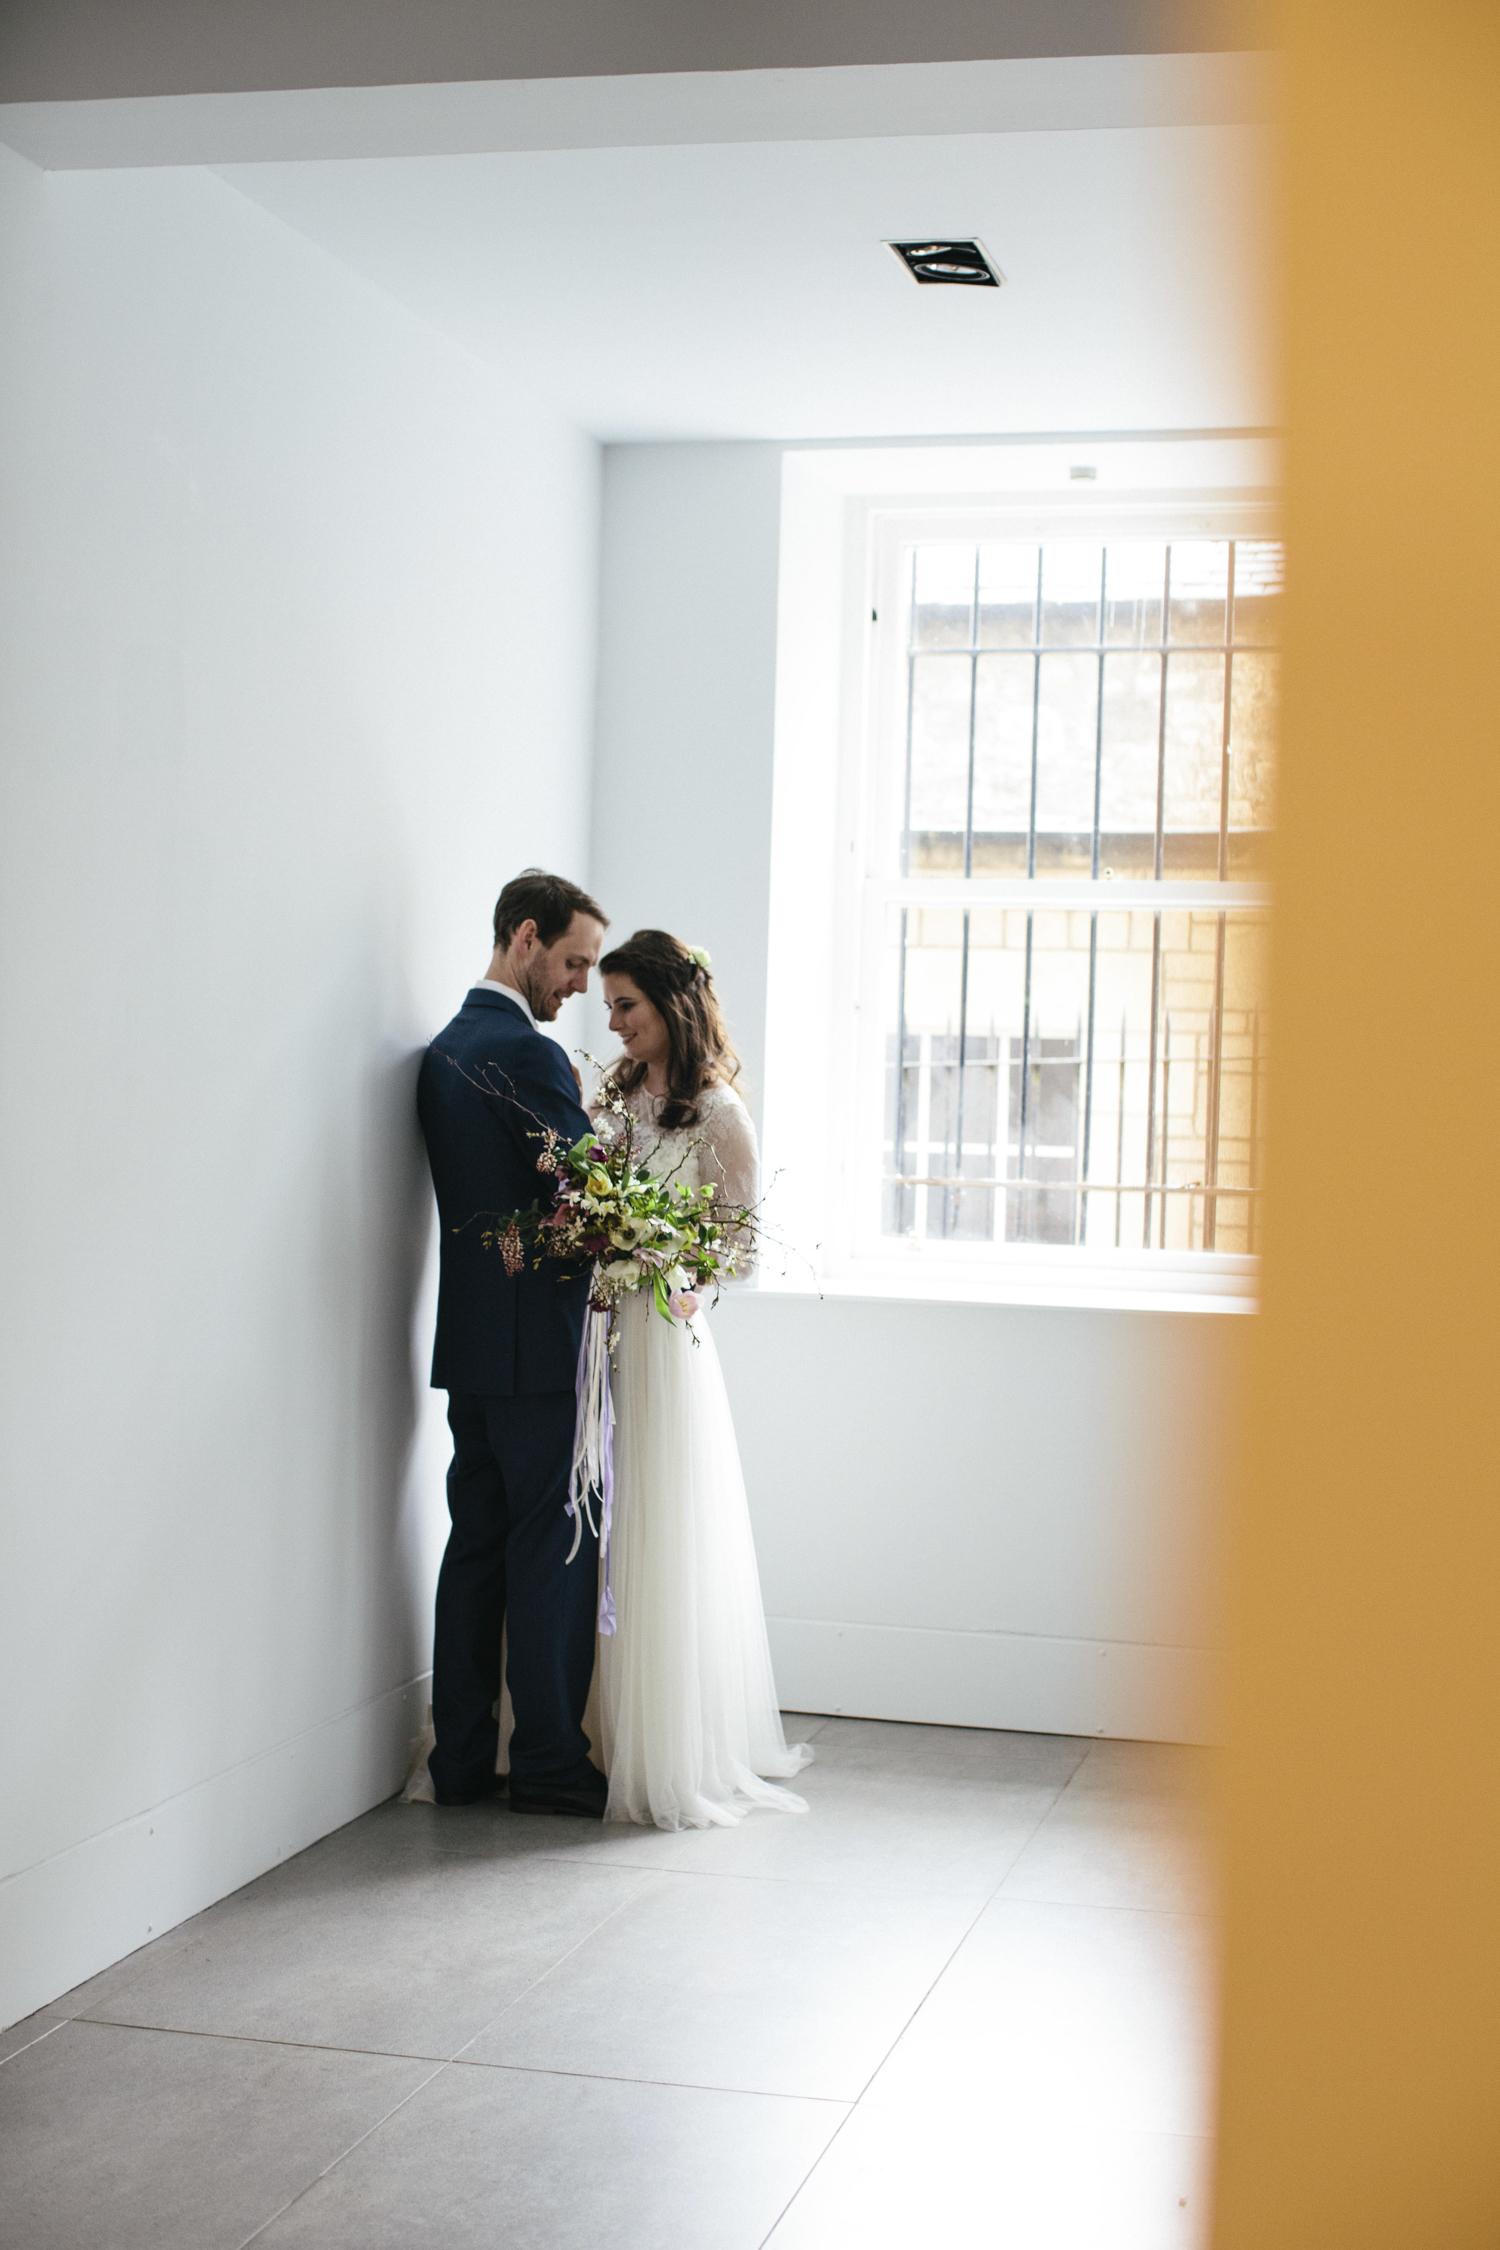 Quirky Wedding Photography Edinburgh Dovecot Studios 070.jpg